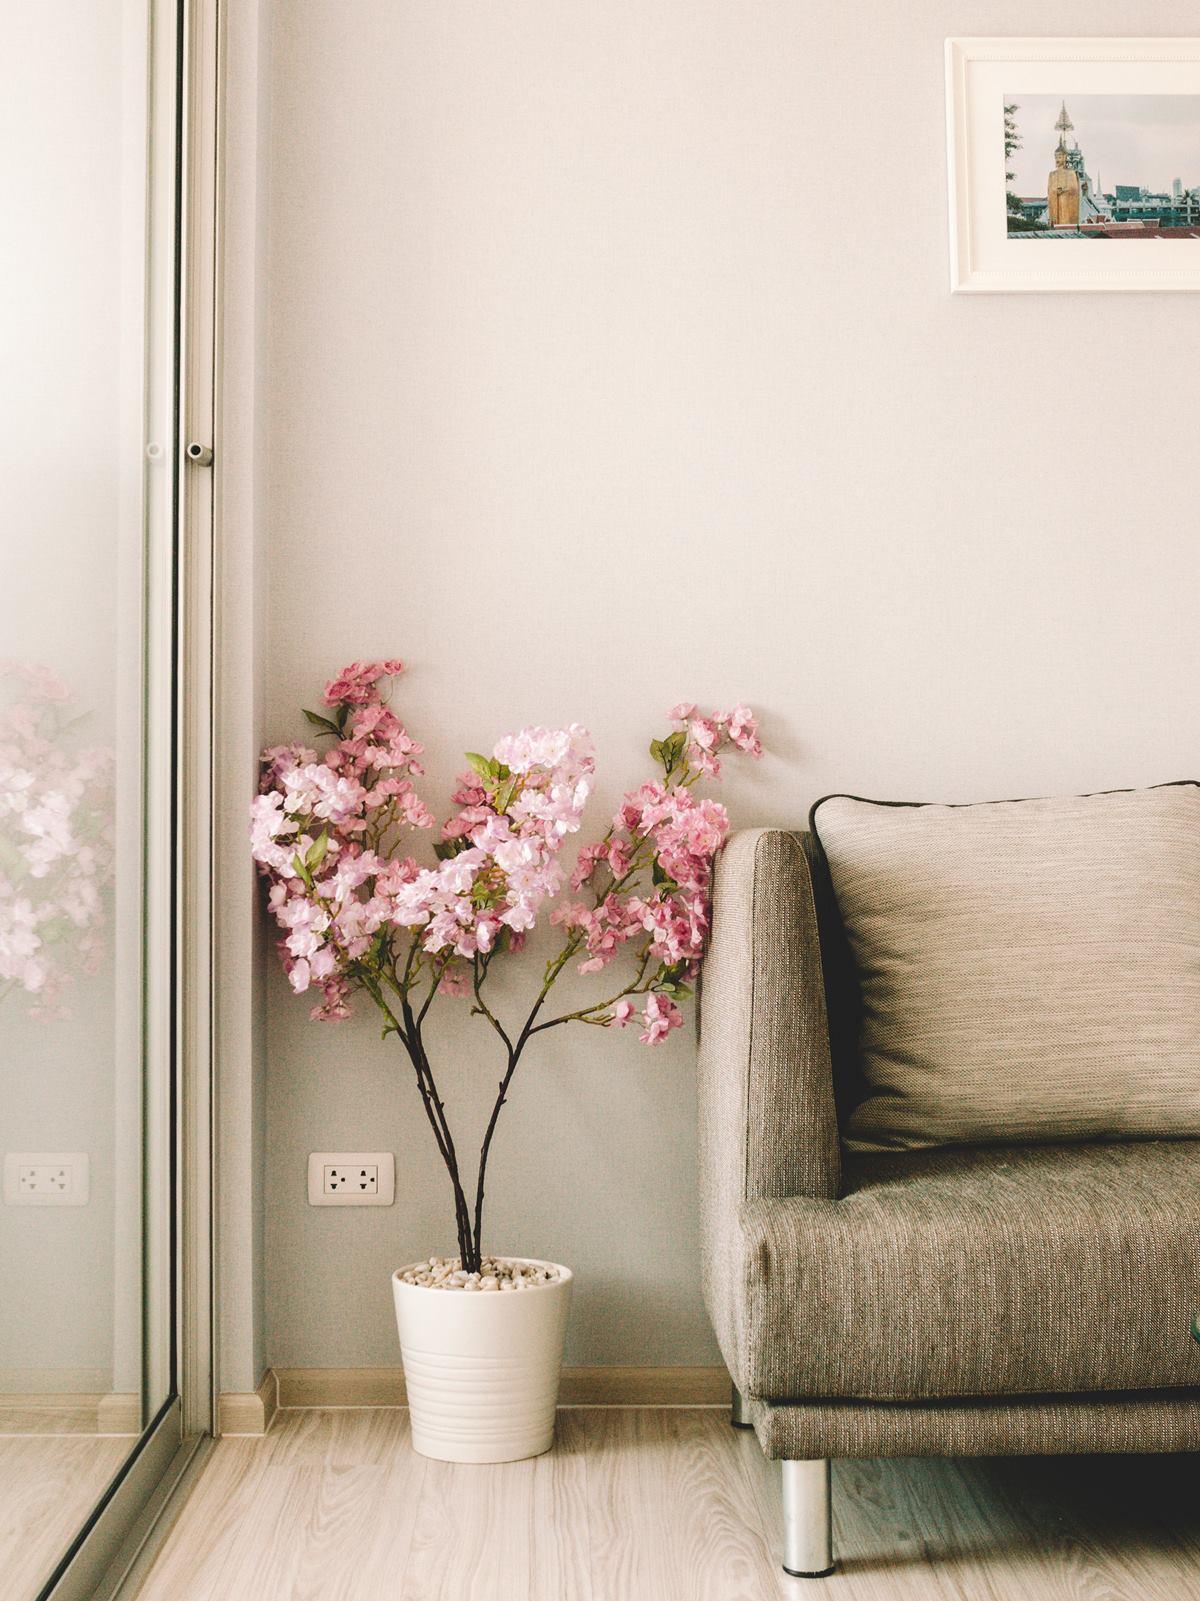 Indoor potted flower